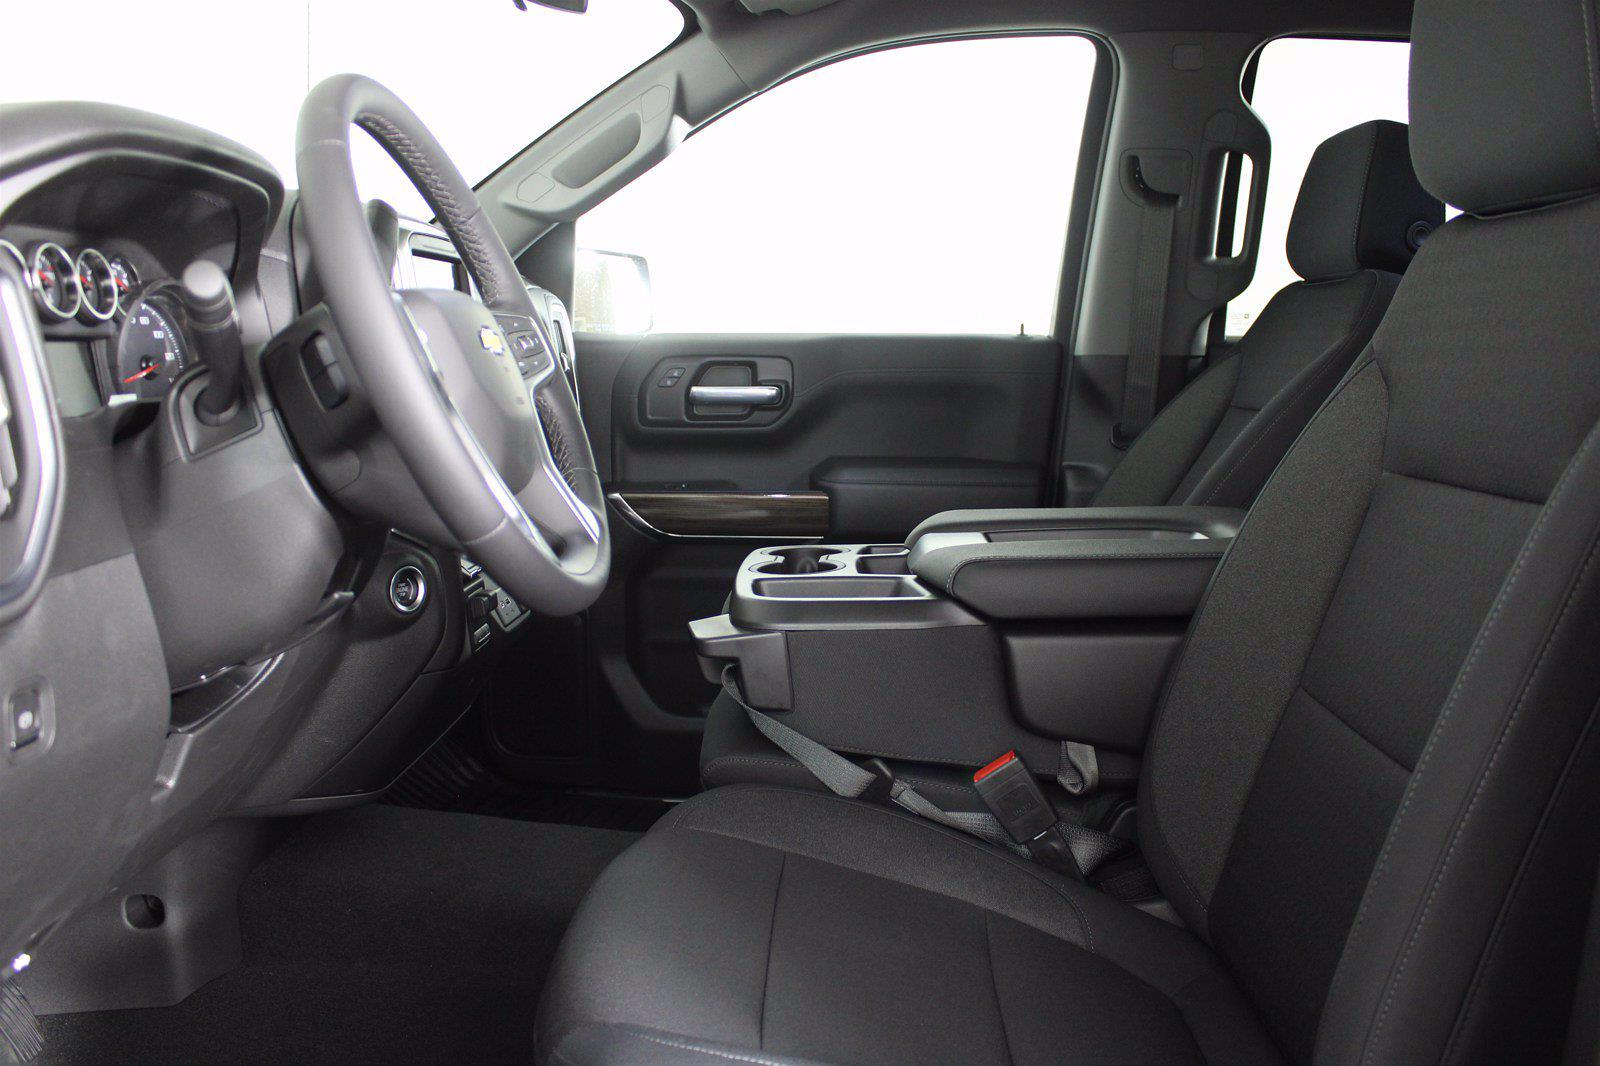 2021 Chevrolet Silverado 1500 Crew Cab 4x4, Pickup #D111137 - photo 15